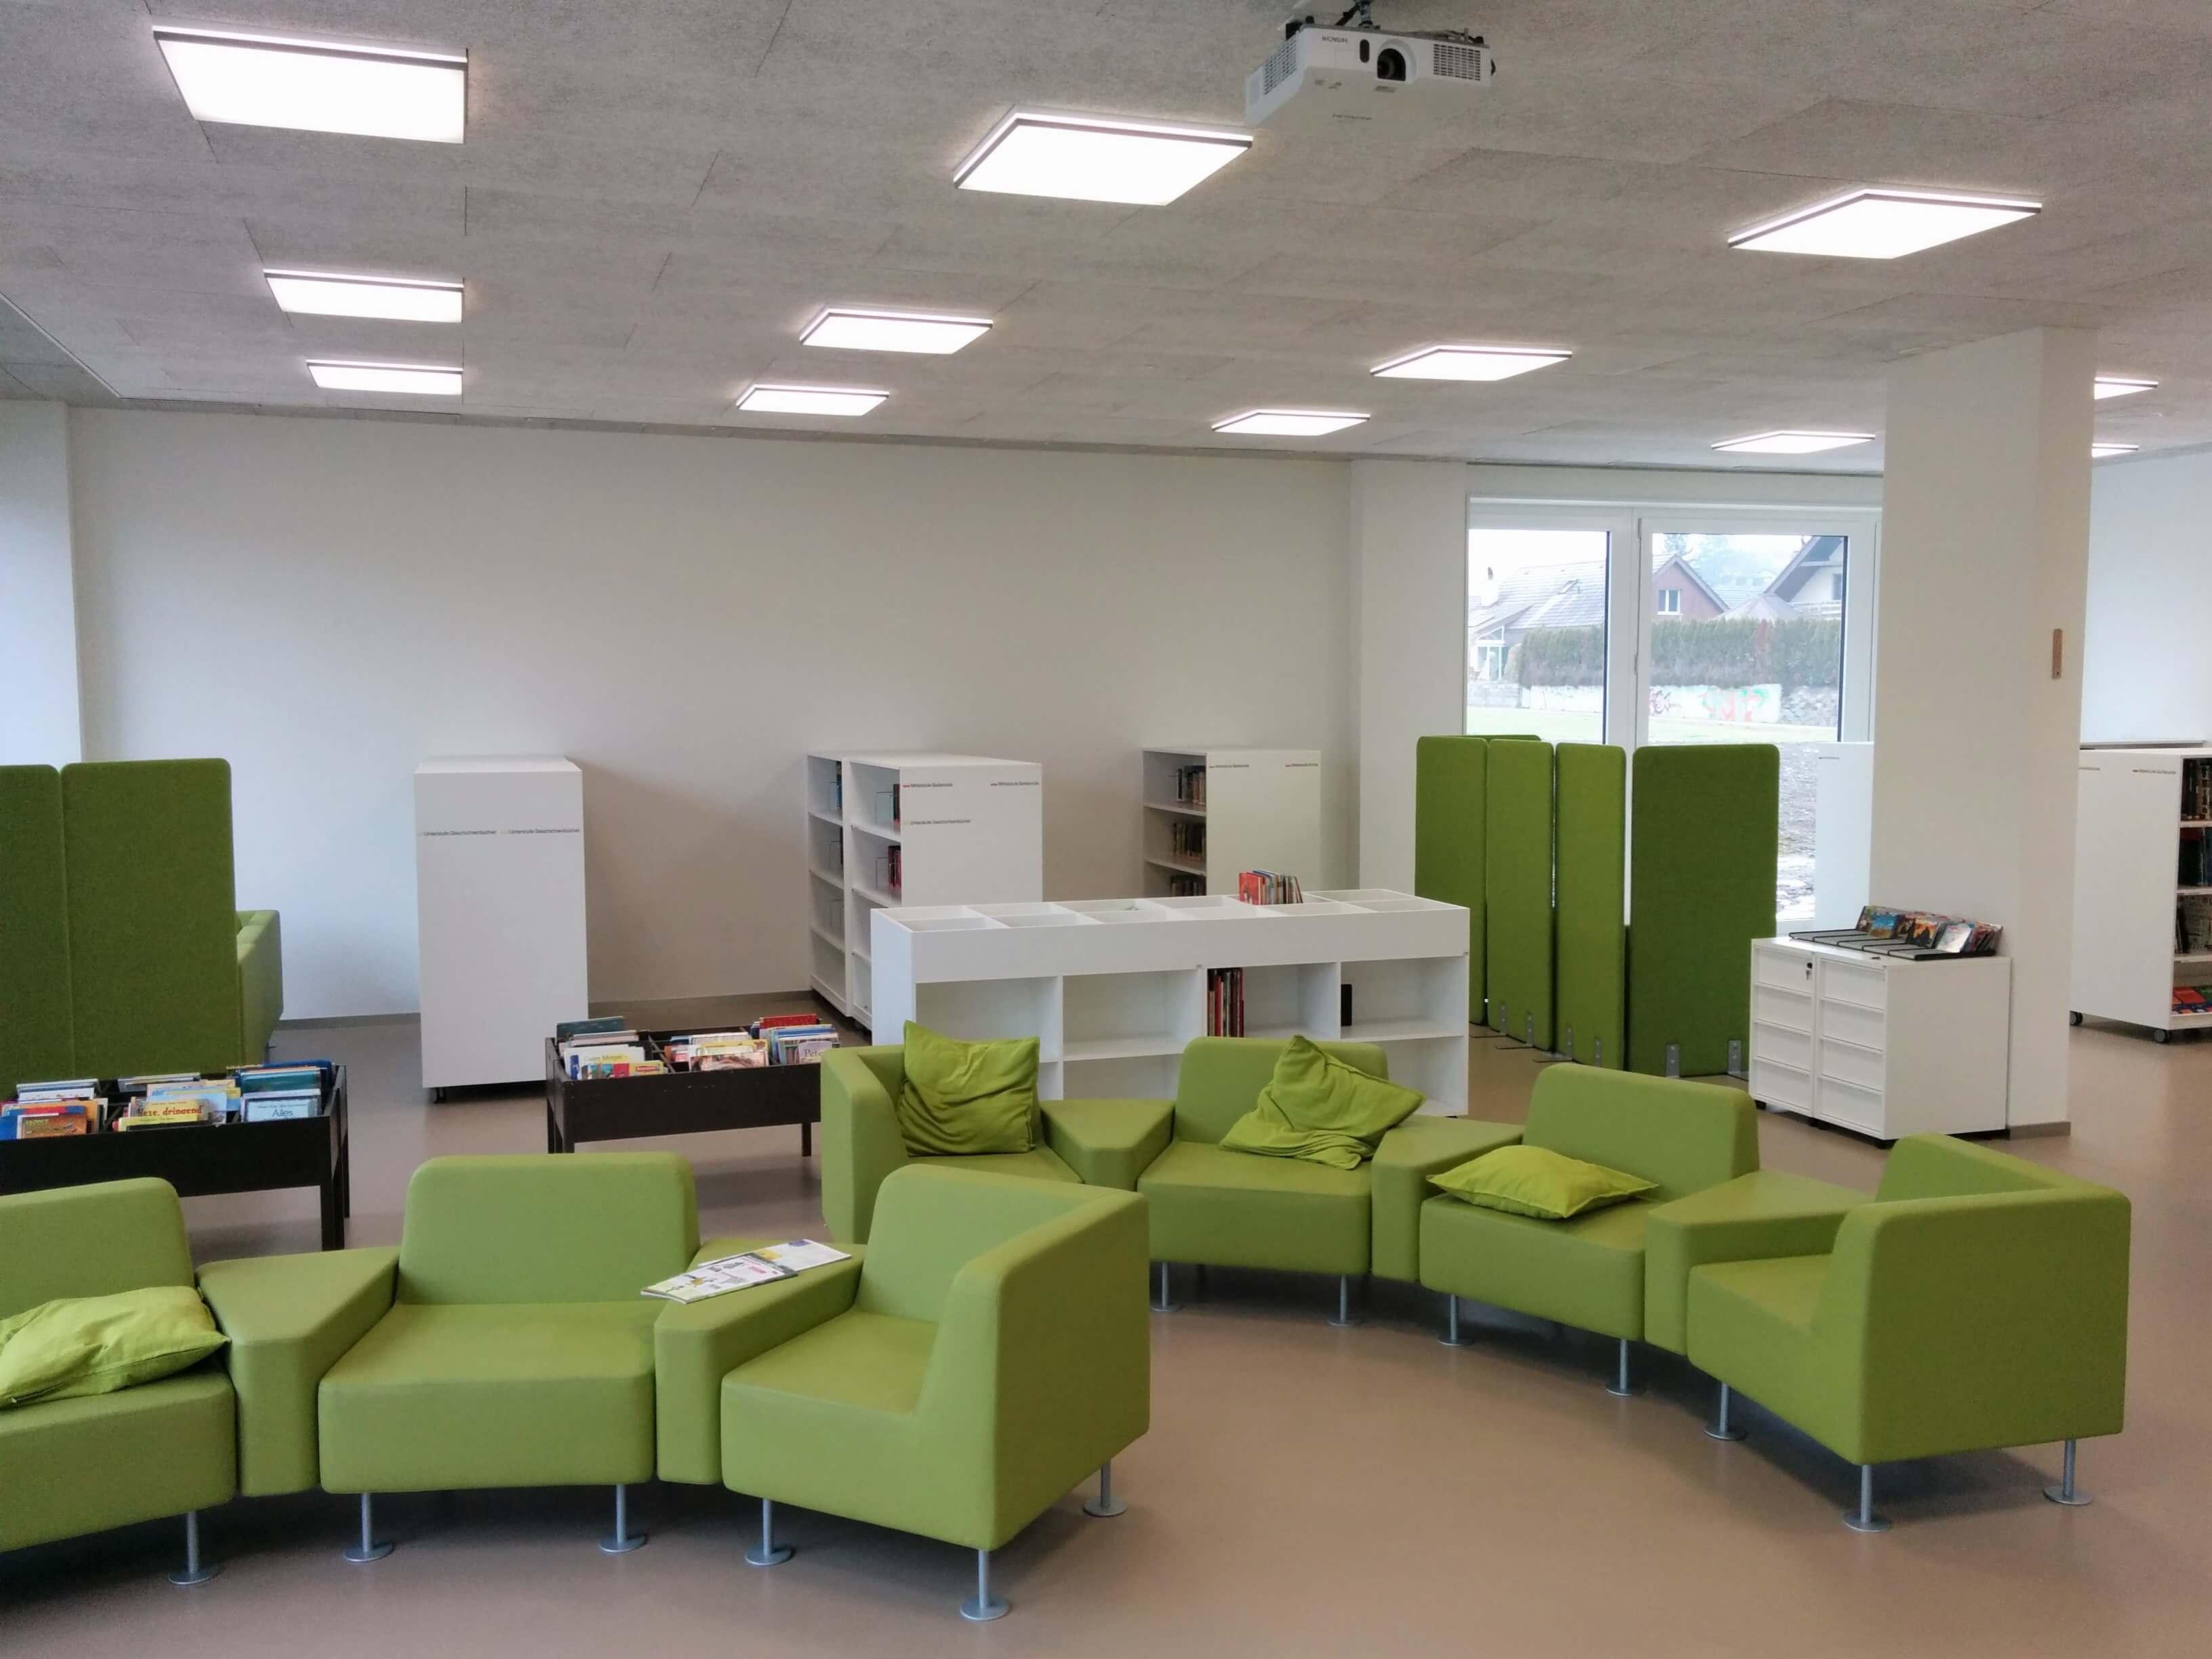 Referenz Regensdorf Schule